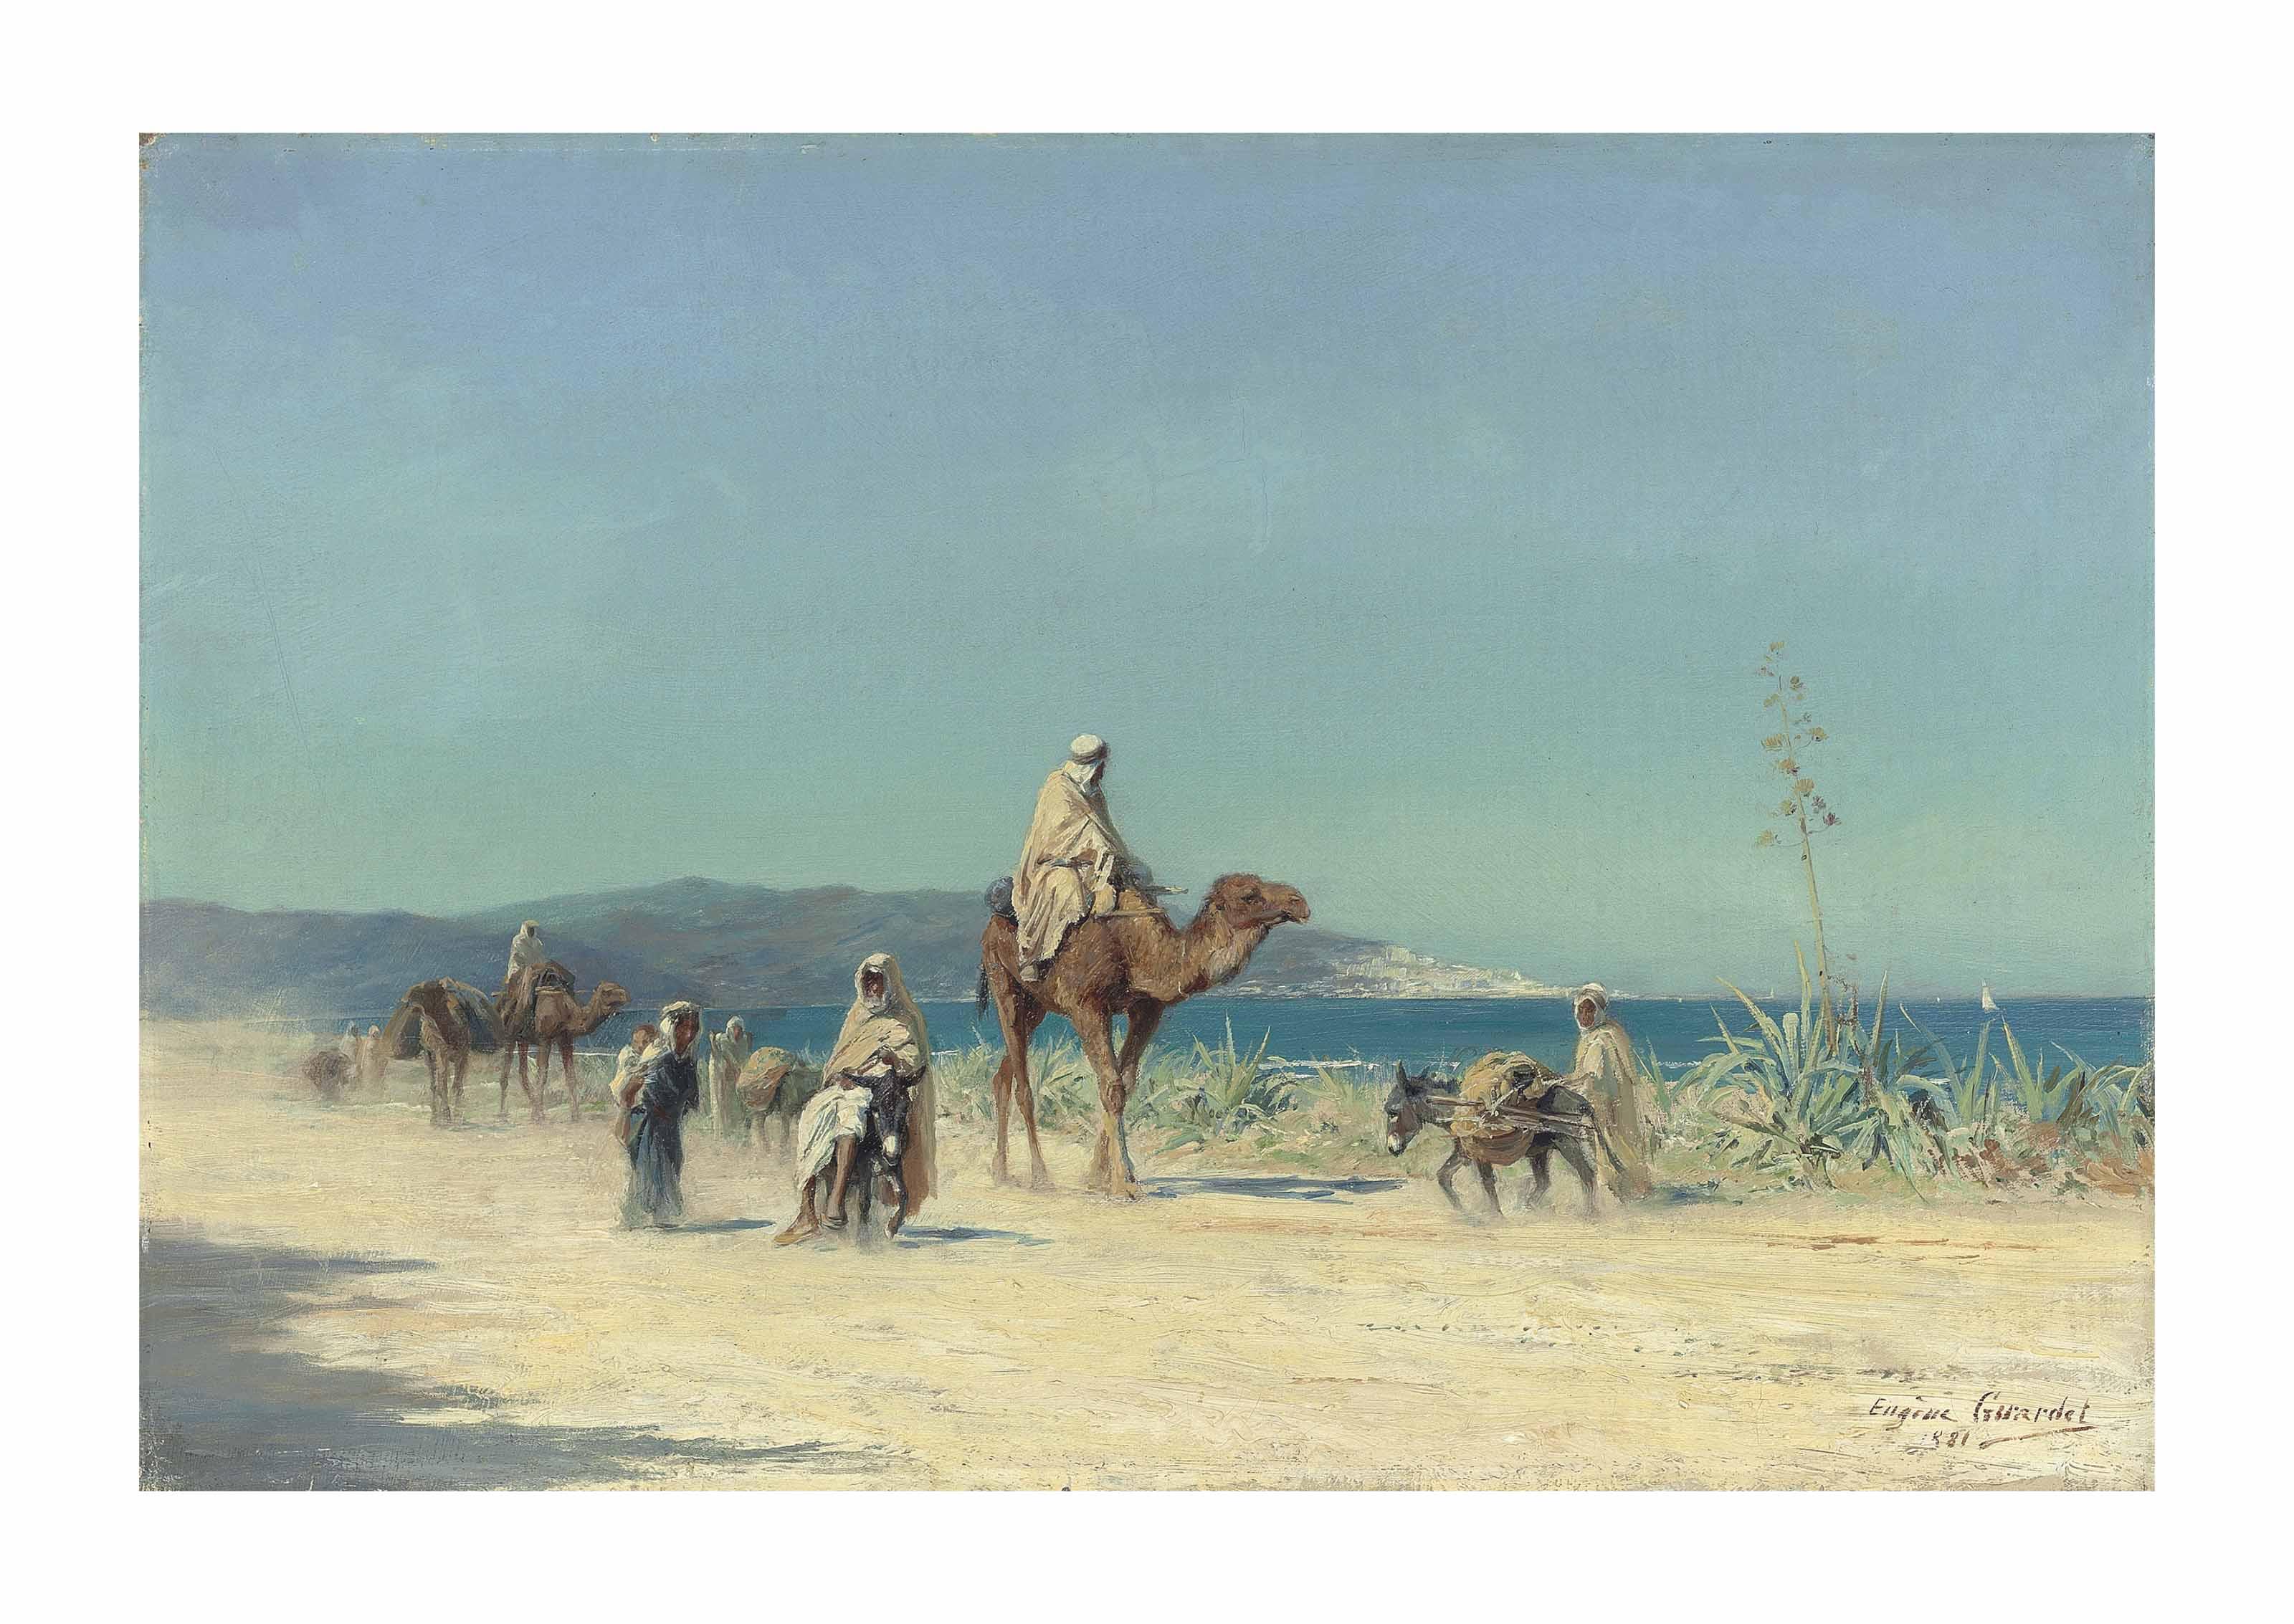 Arabs on a costal road